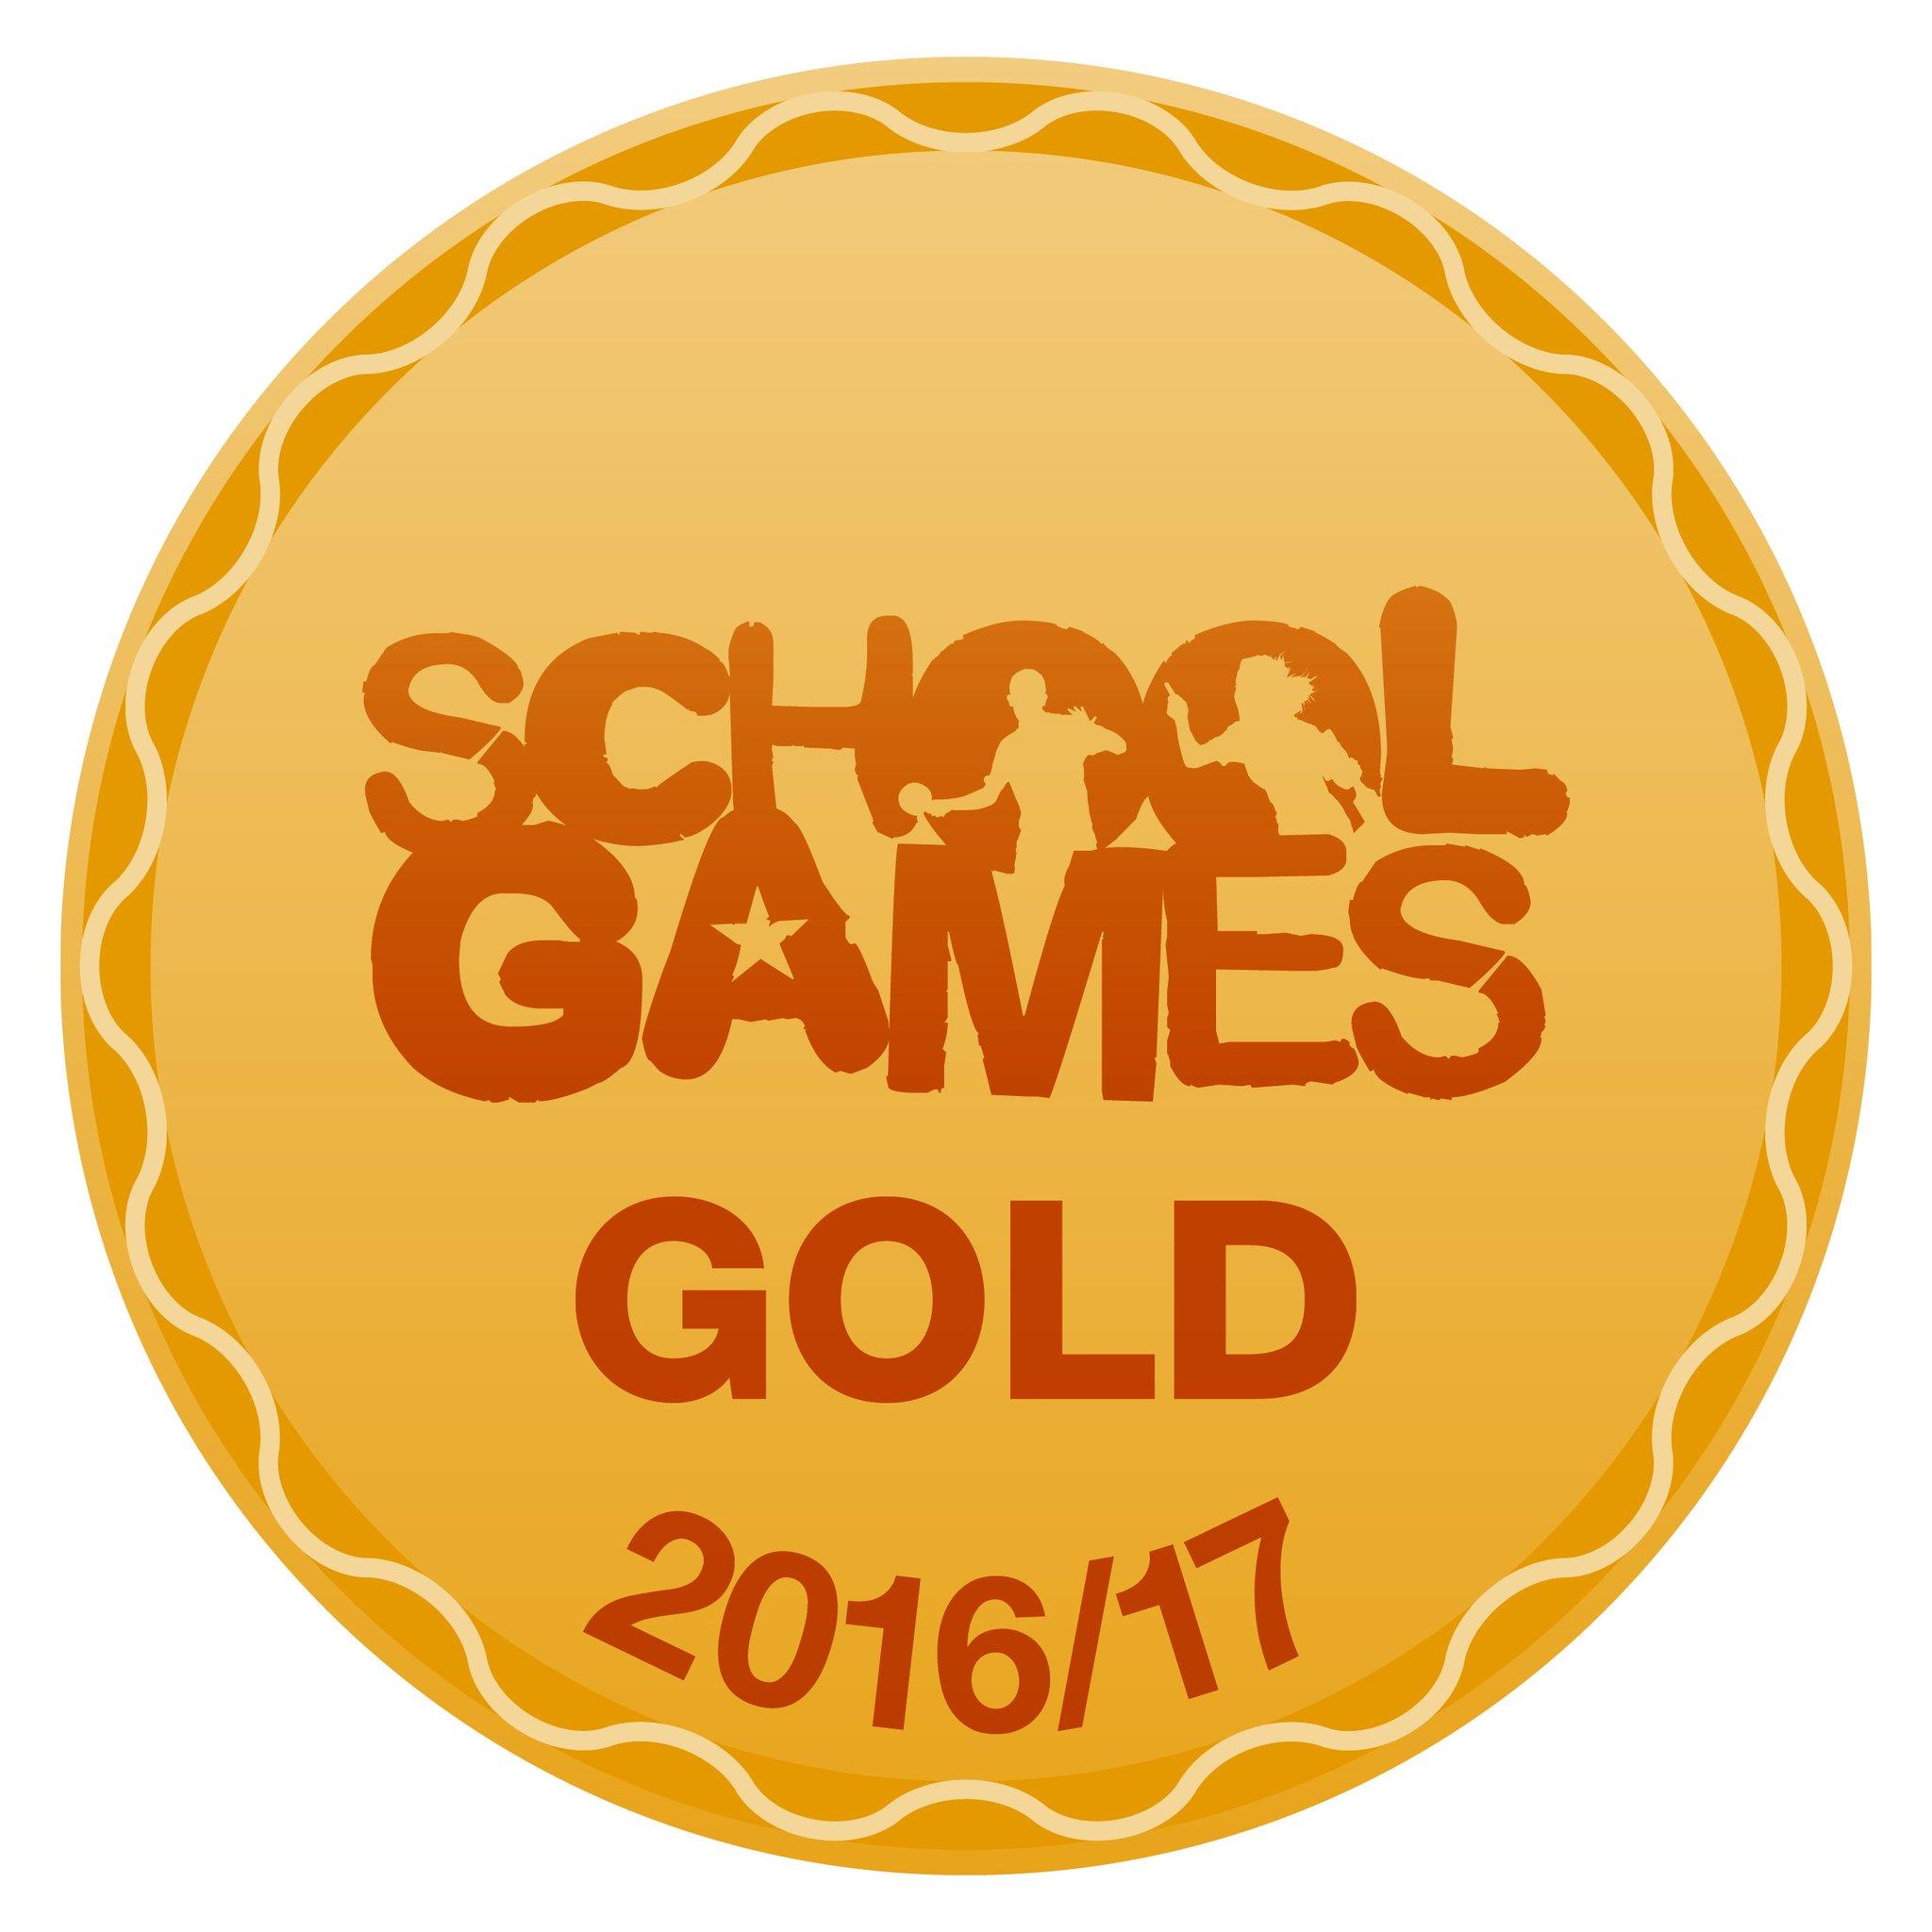 16 17 Gold Mark